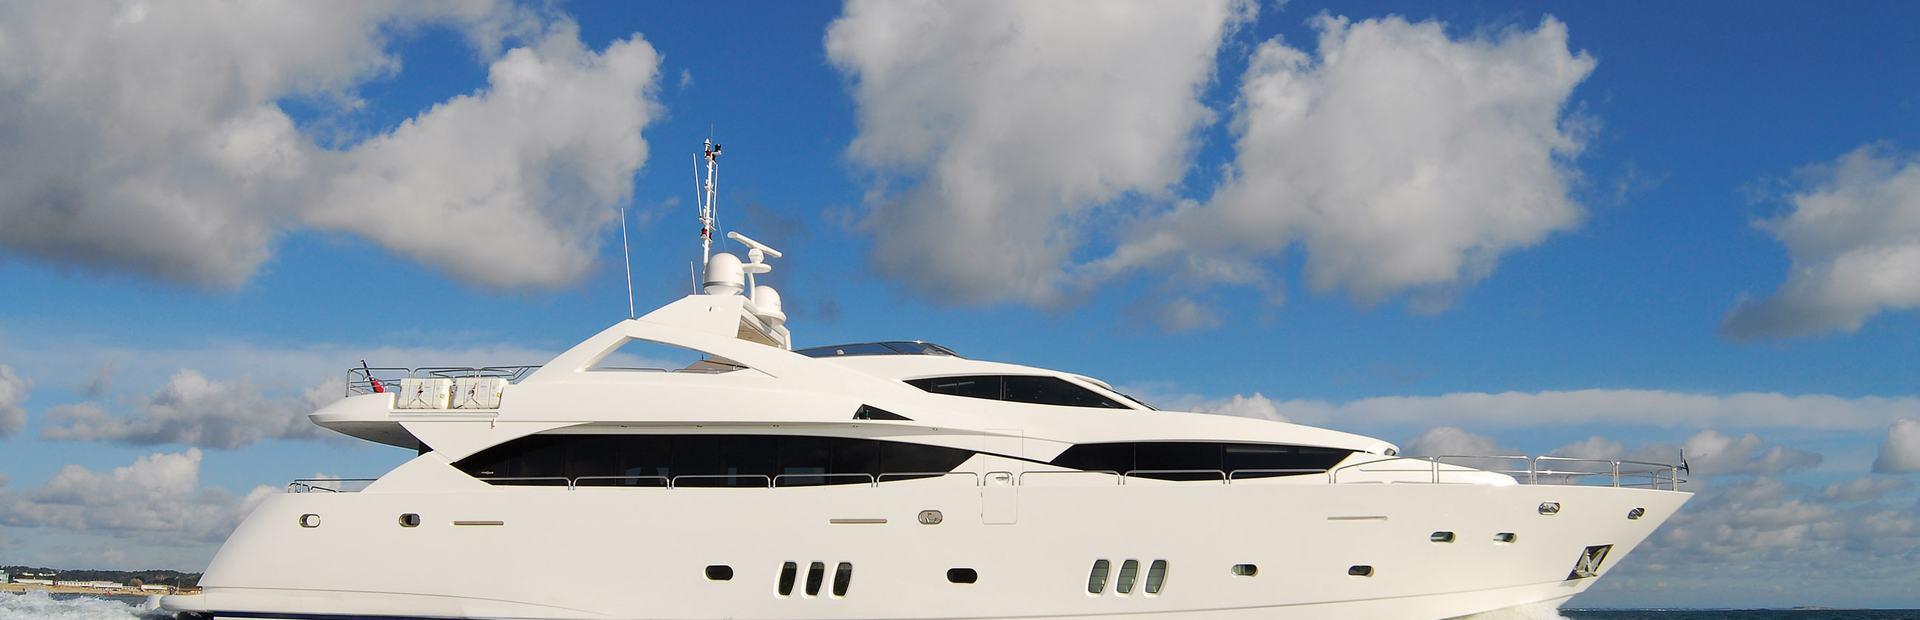 34 Metre Yacht Yacht Charter